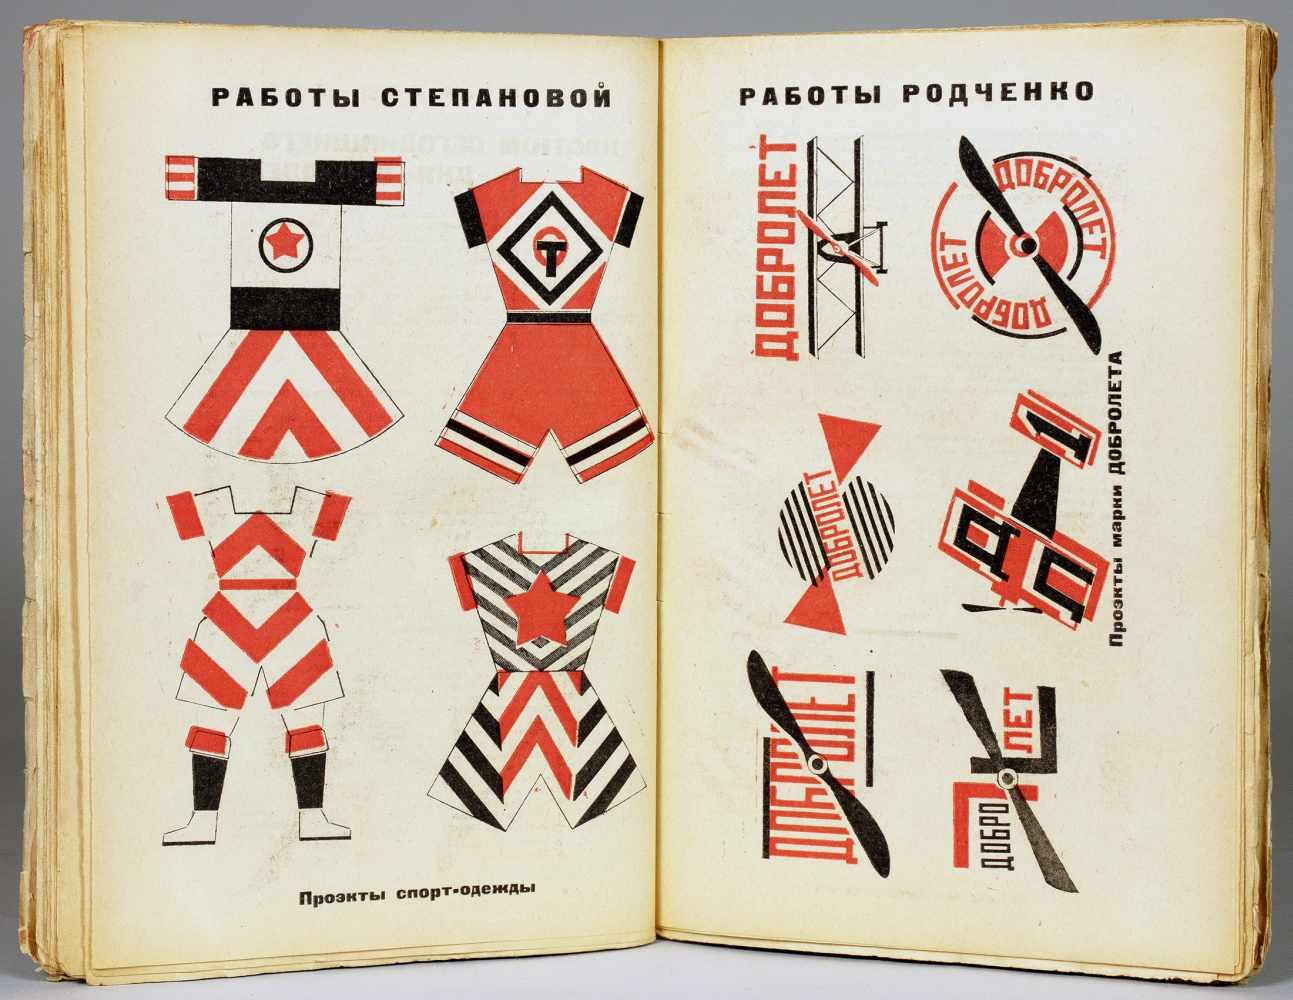 LEF. (Journal der Linken Front der Kunst). No. 2. Moskau und Petersburg, Gosizdat April/Mai 1923. - Image 2 of 2